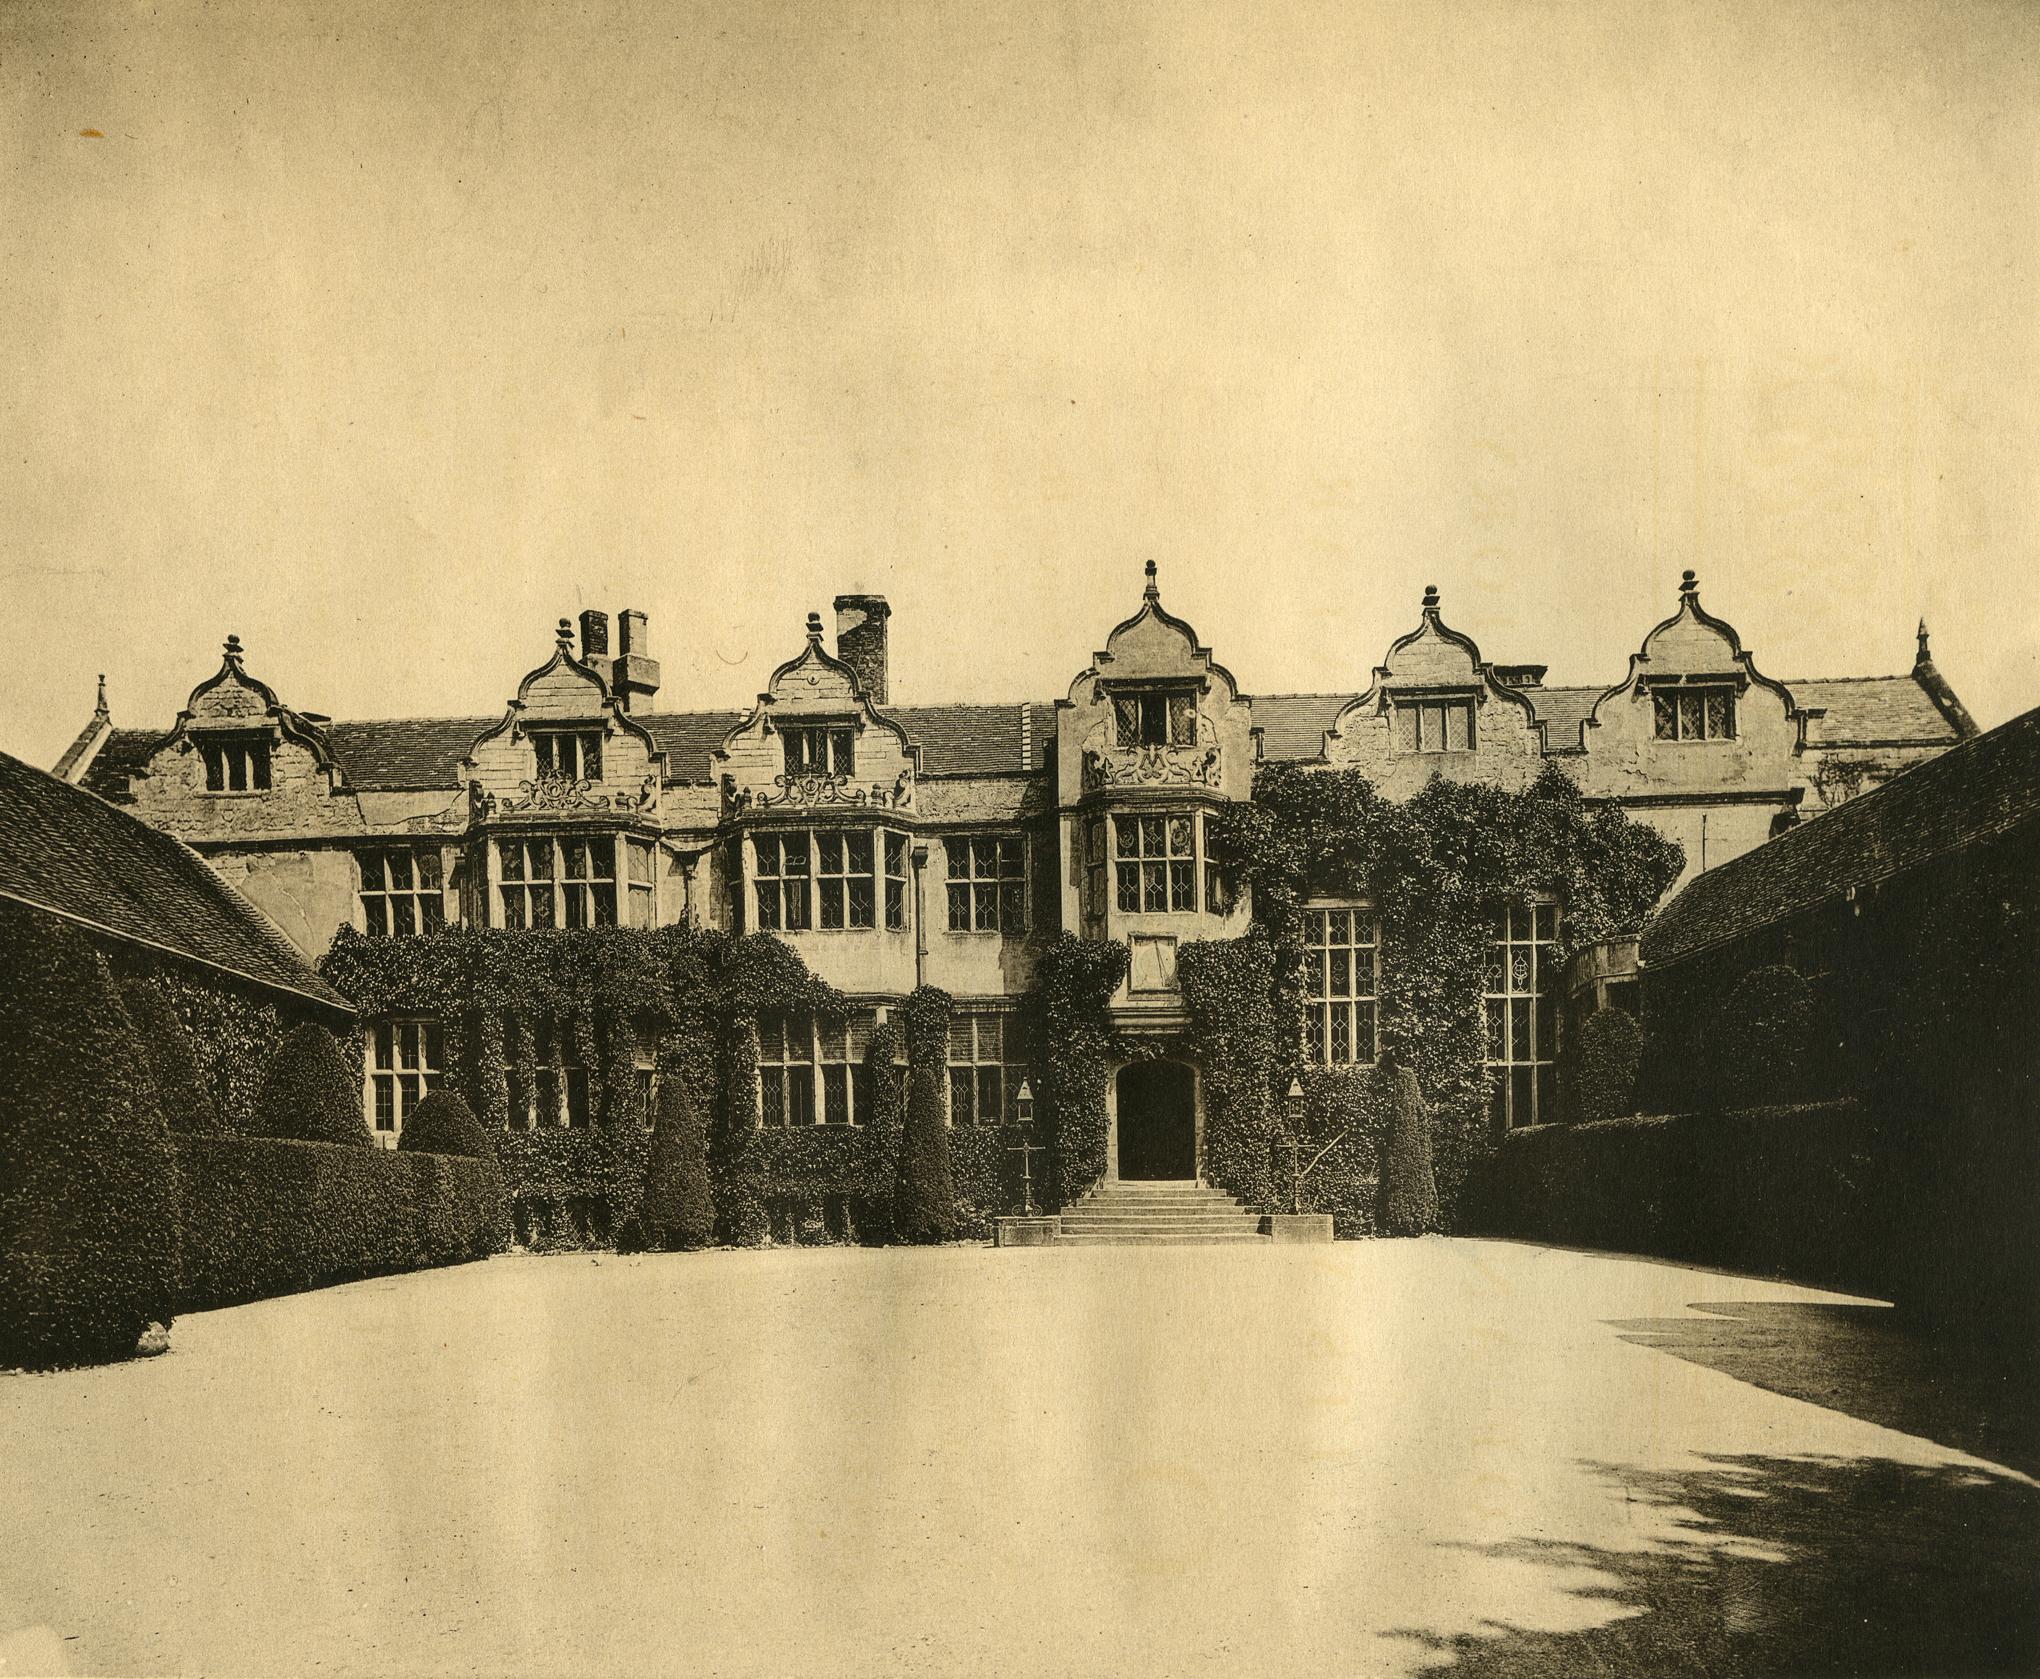 Warwick Priory, c. 1910, as depicted in Alexander Weddell's